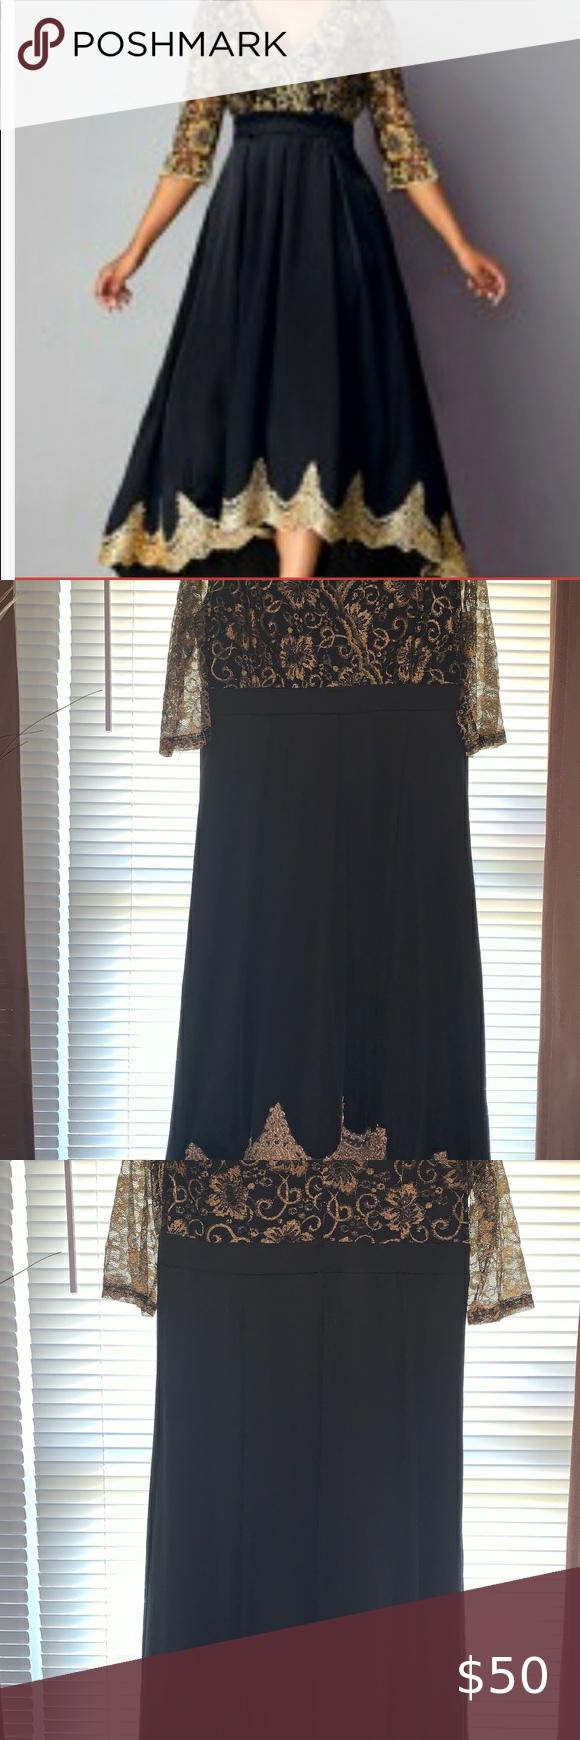 Brand New Hi Lo V Neck Lace Panel Dress Panel Dress Dresses Gold And Black Dress [ 1740 x 580 Pixel ]